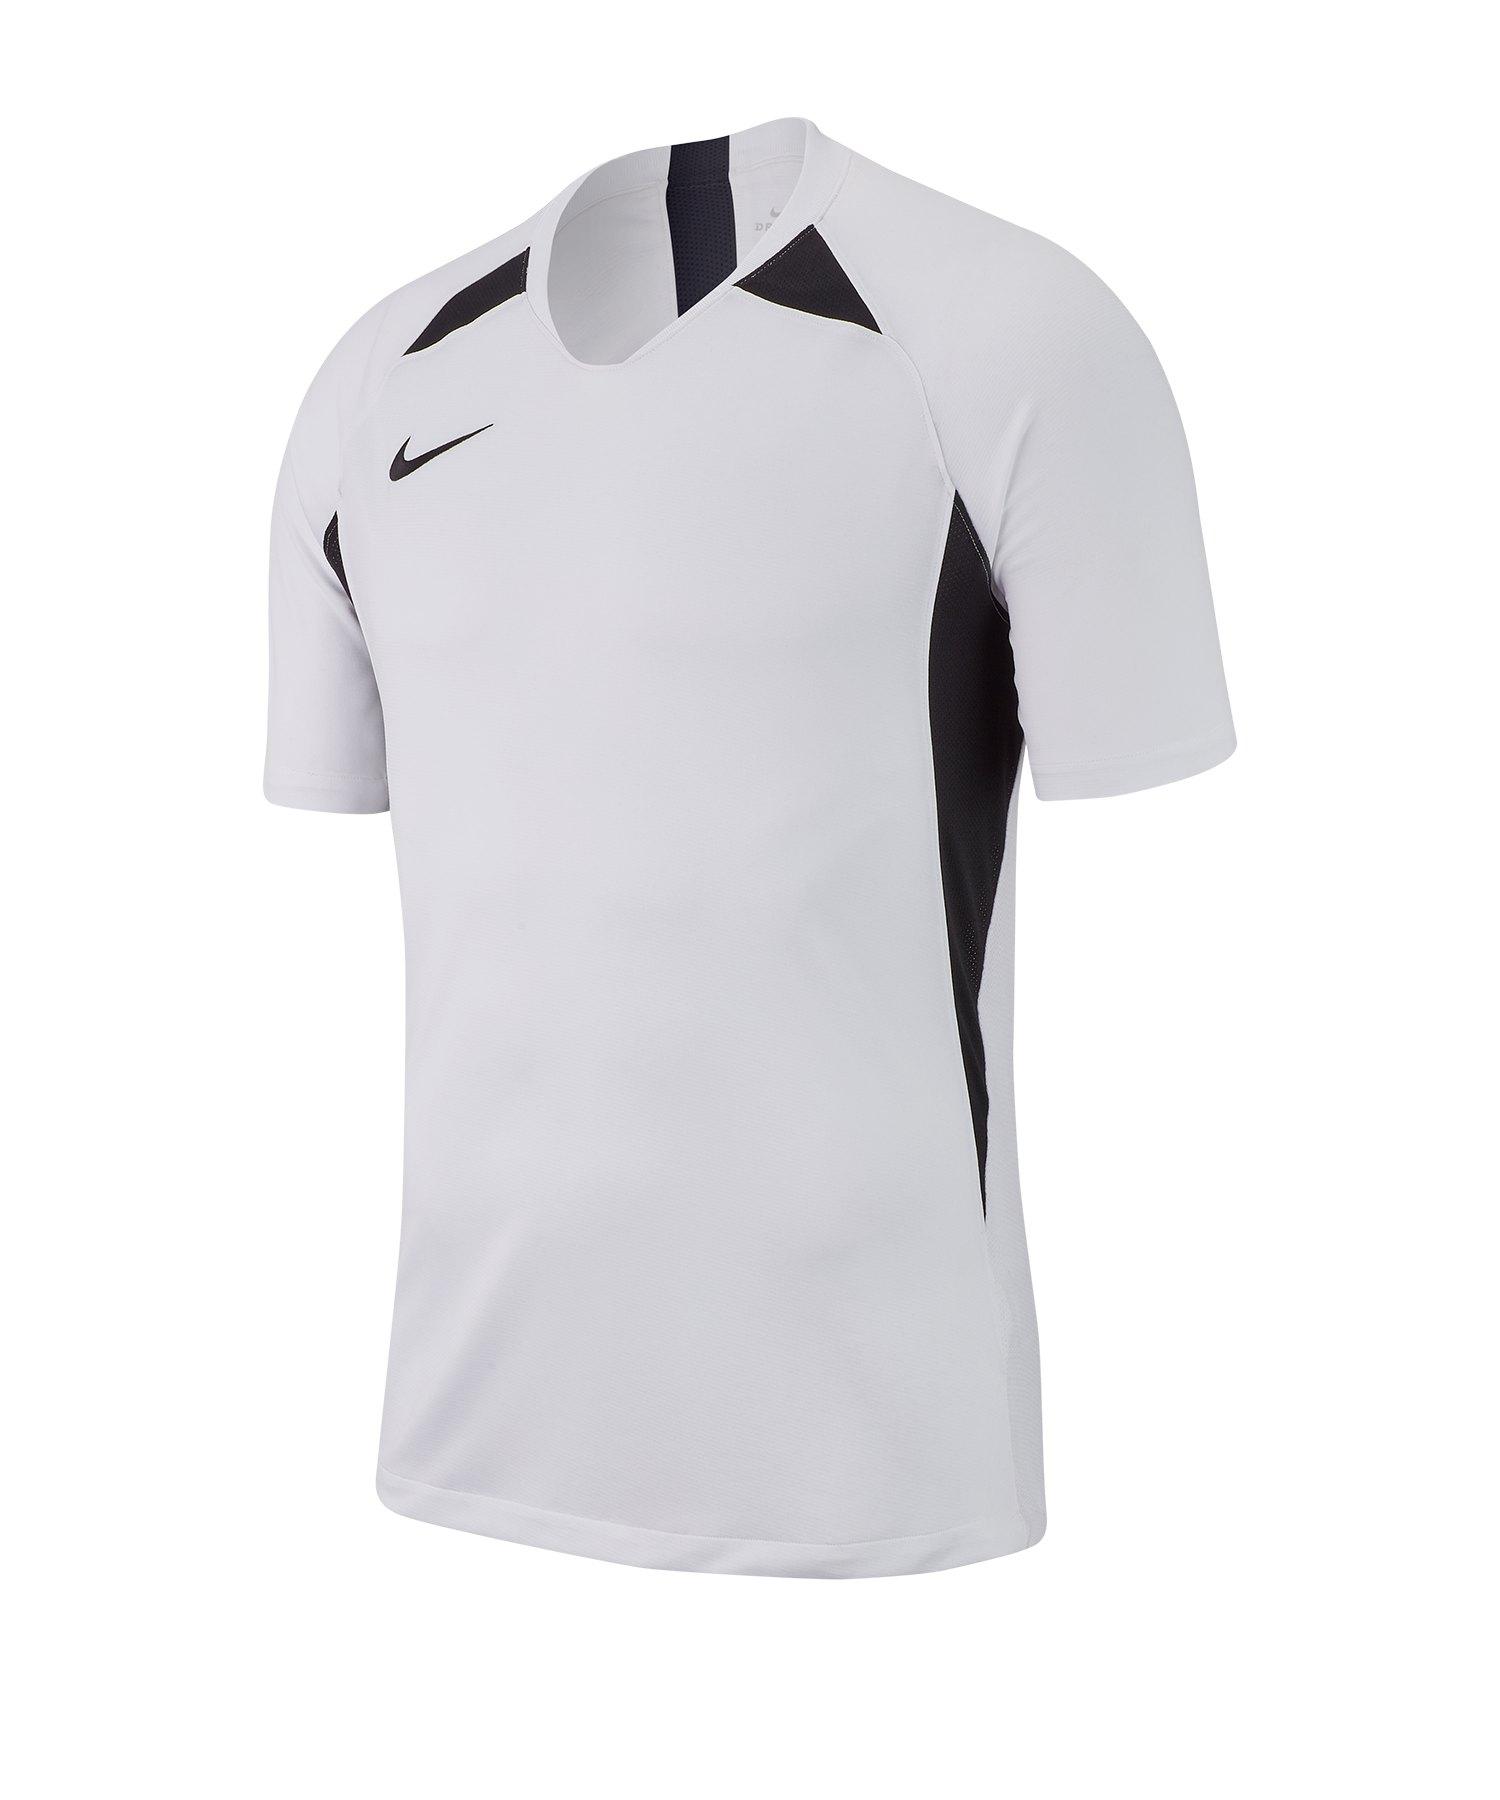 Nike Legend Trikot kurzarm Weiss Schwarz F100 - weiss